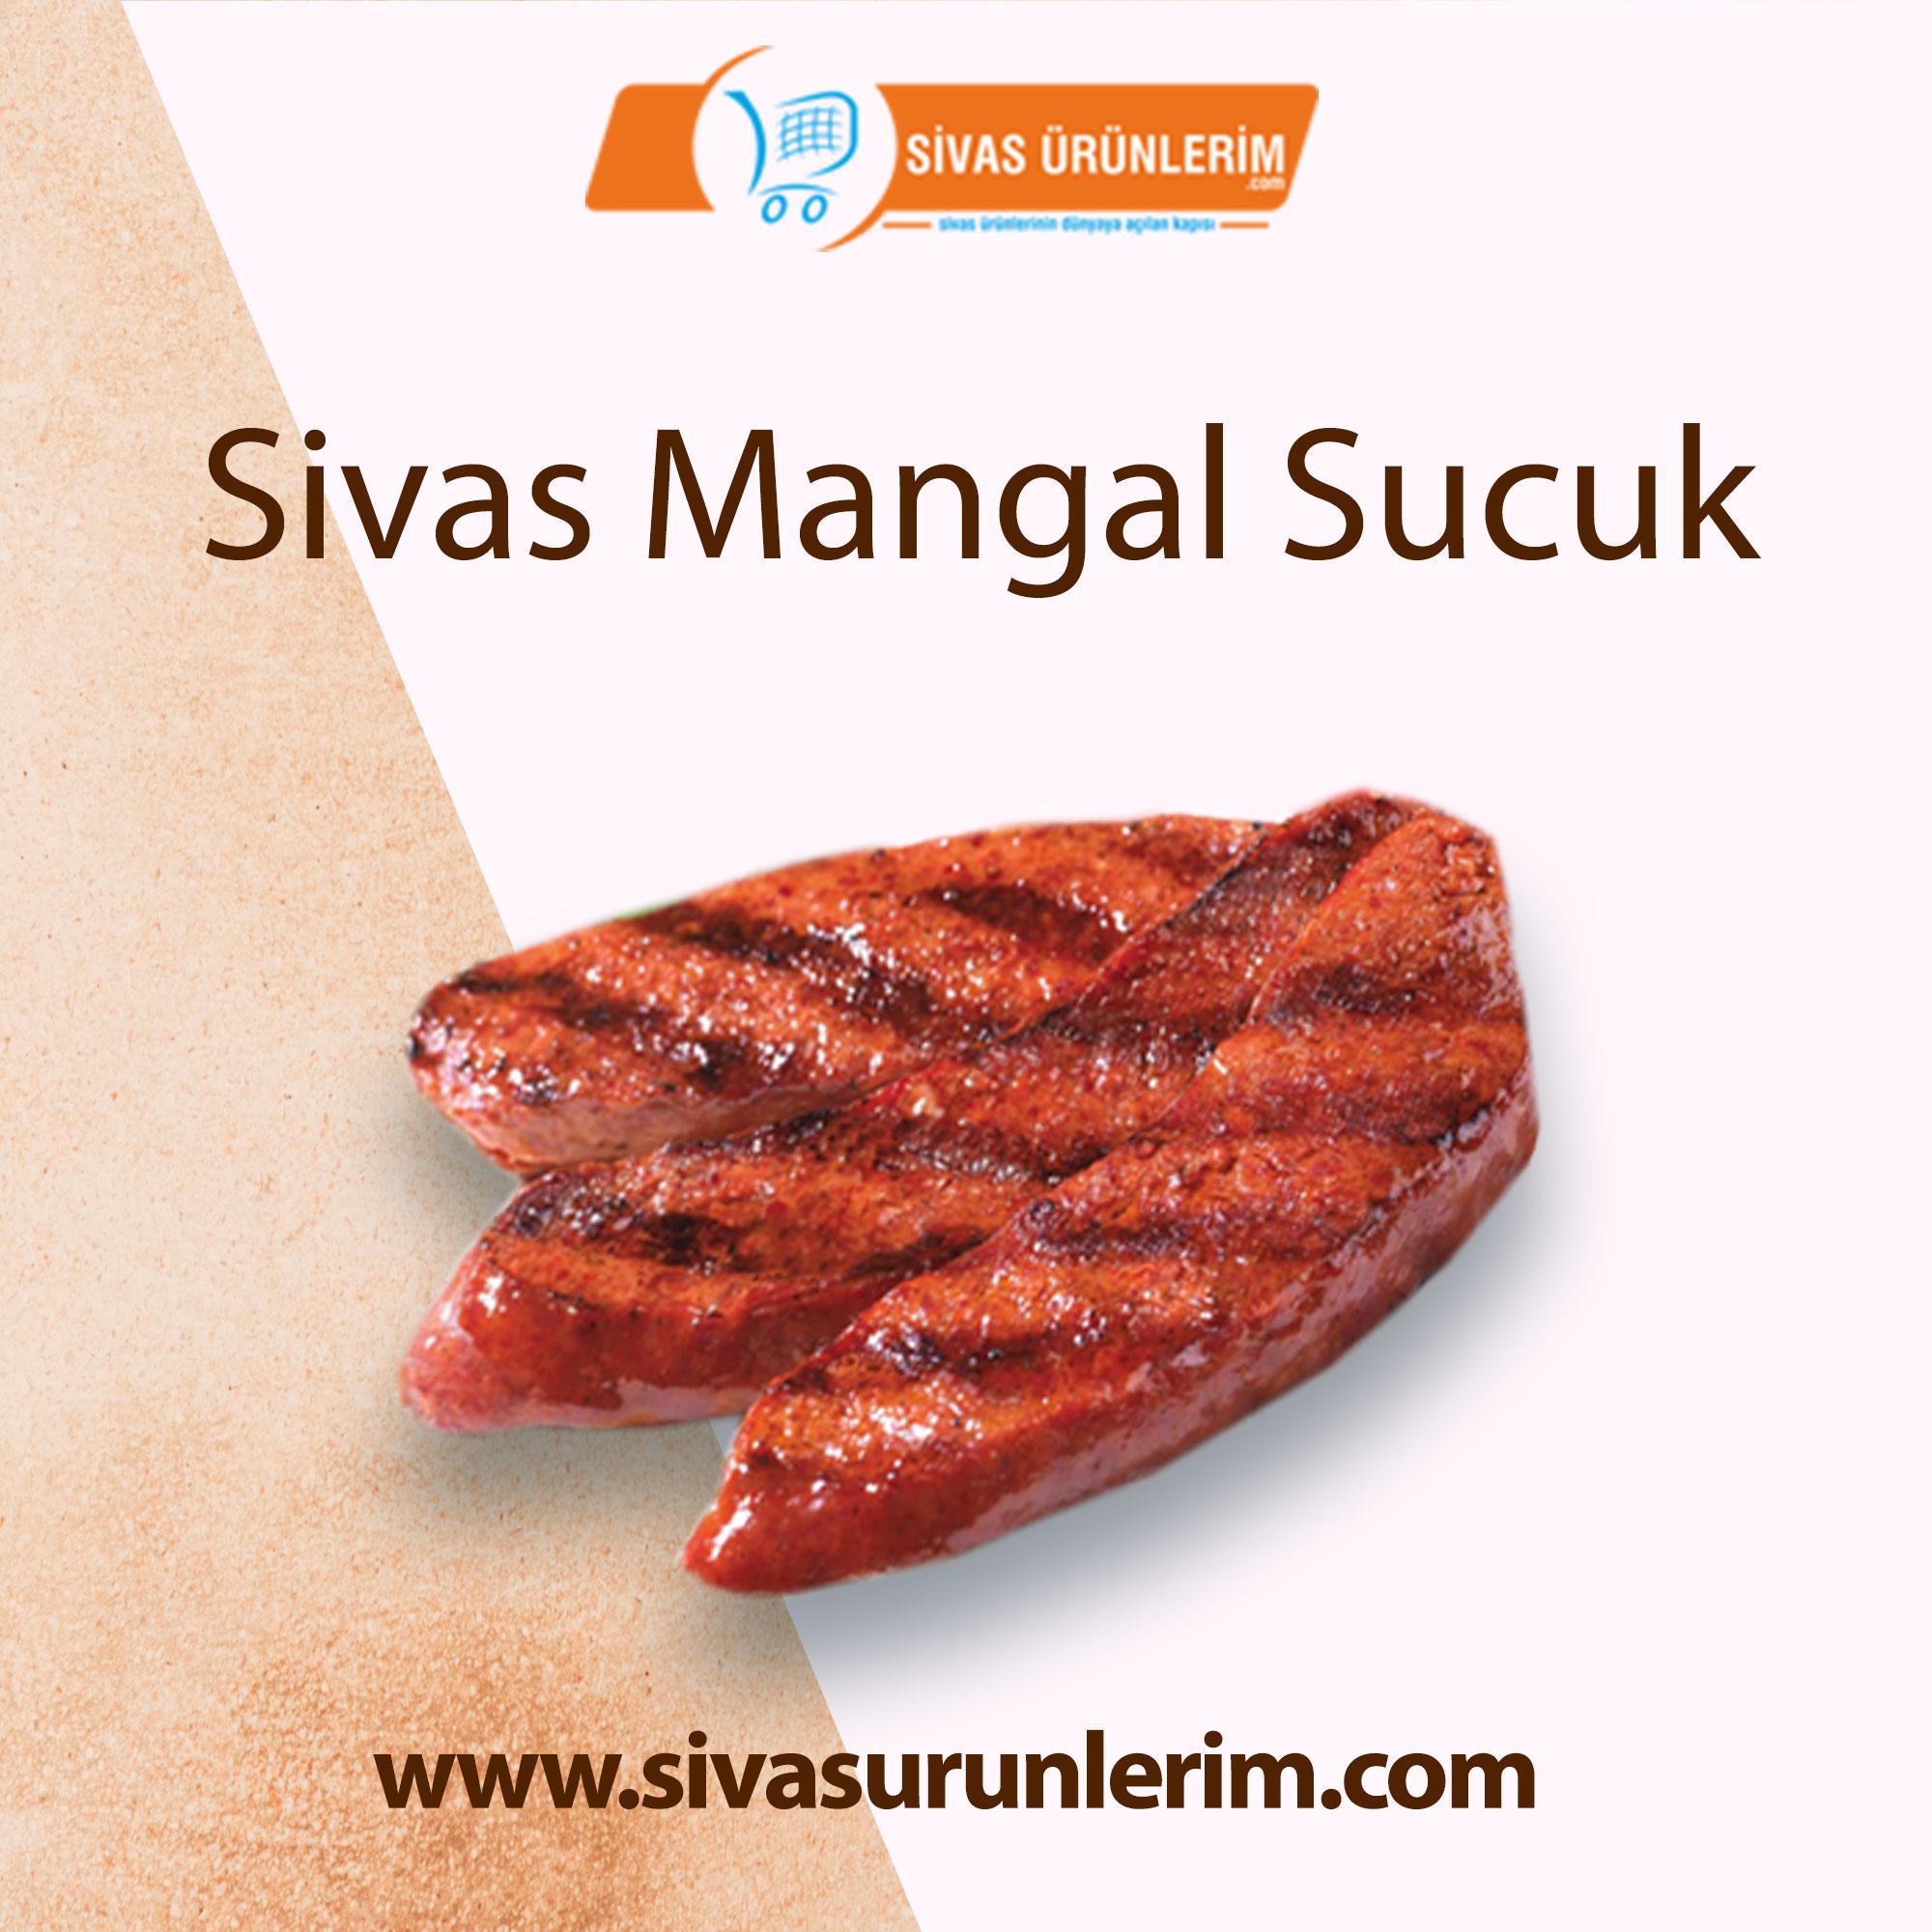 Sivas Mangal Sucuk